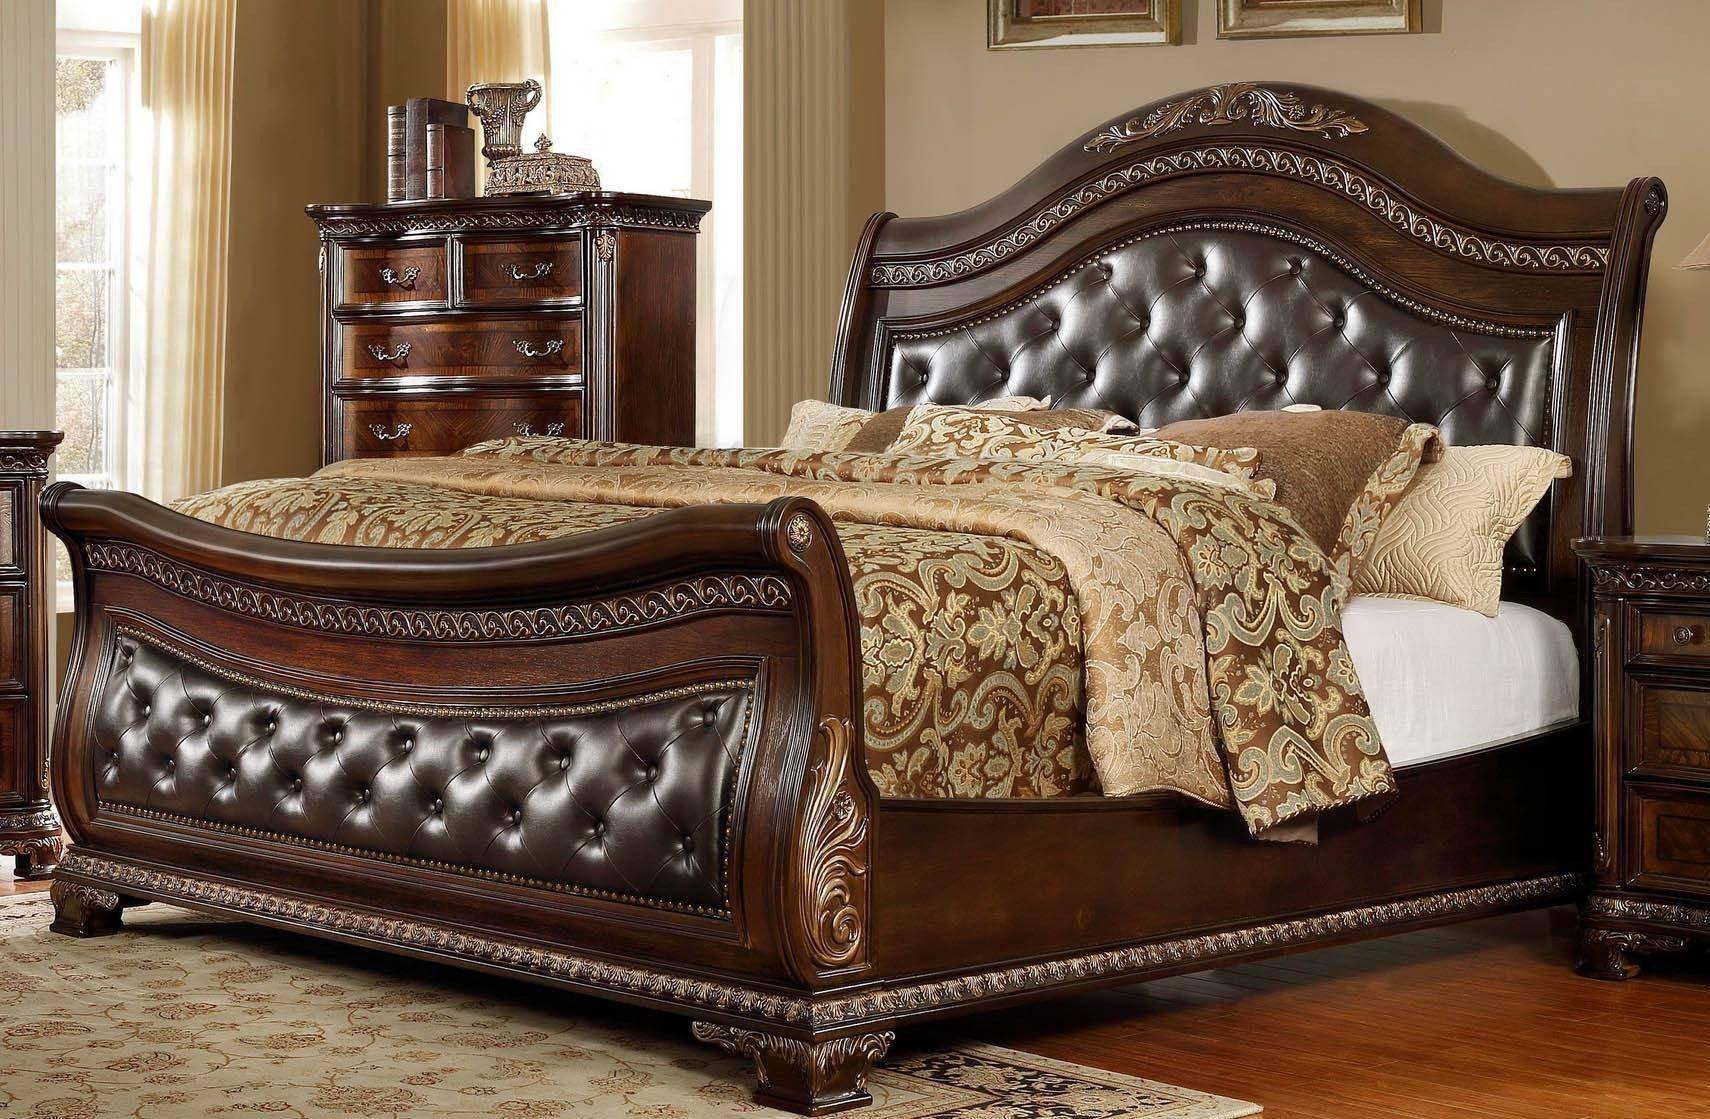 Leather Headboard Bedroom Set Fresh Mcferran B9588 King Sleigh Bed In Oak Veneers Dark Cherry Finish Leather